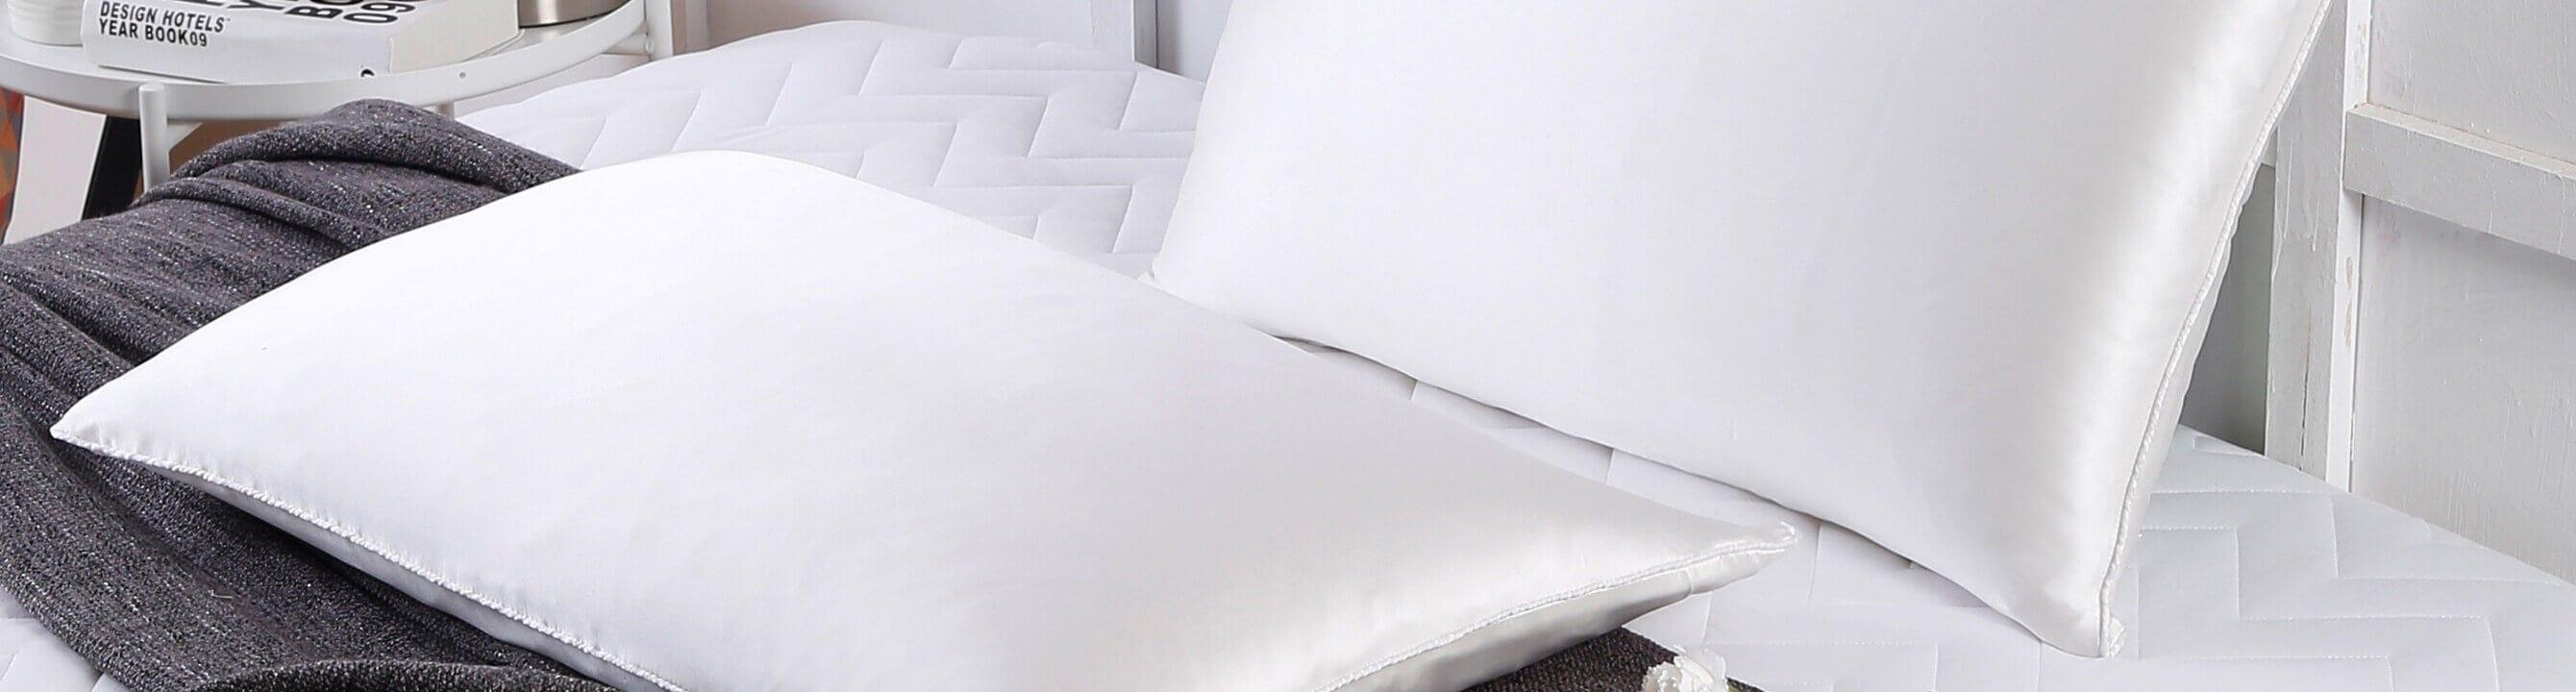 Шёлковые подушки